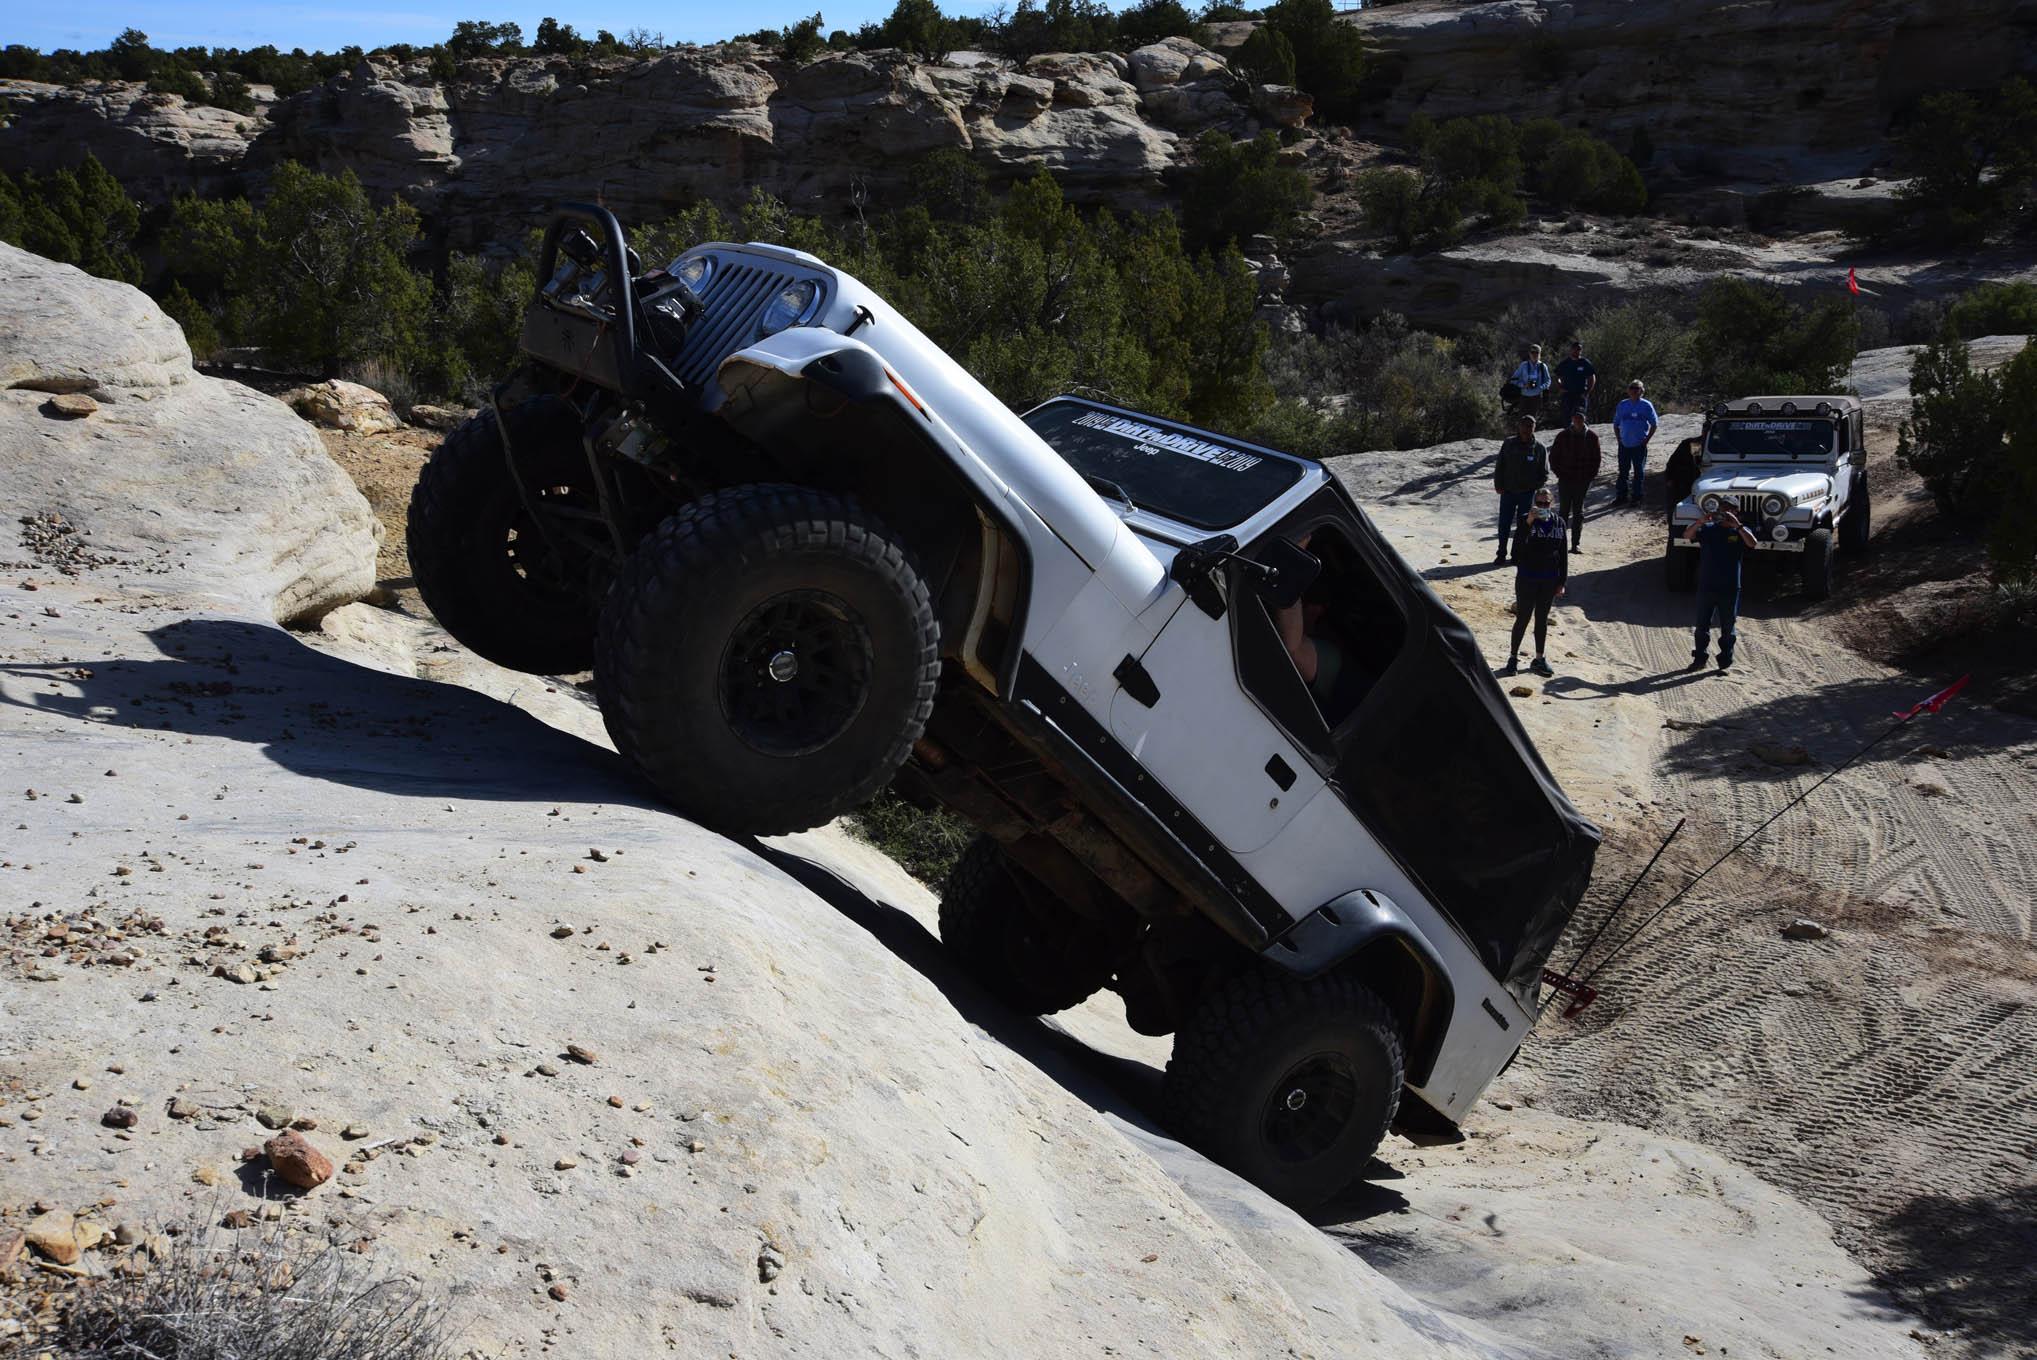 033 jeep 1984 scrambler cj8 cj 8 jp magazine stuart bourdon aaron paris